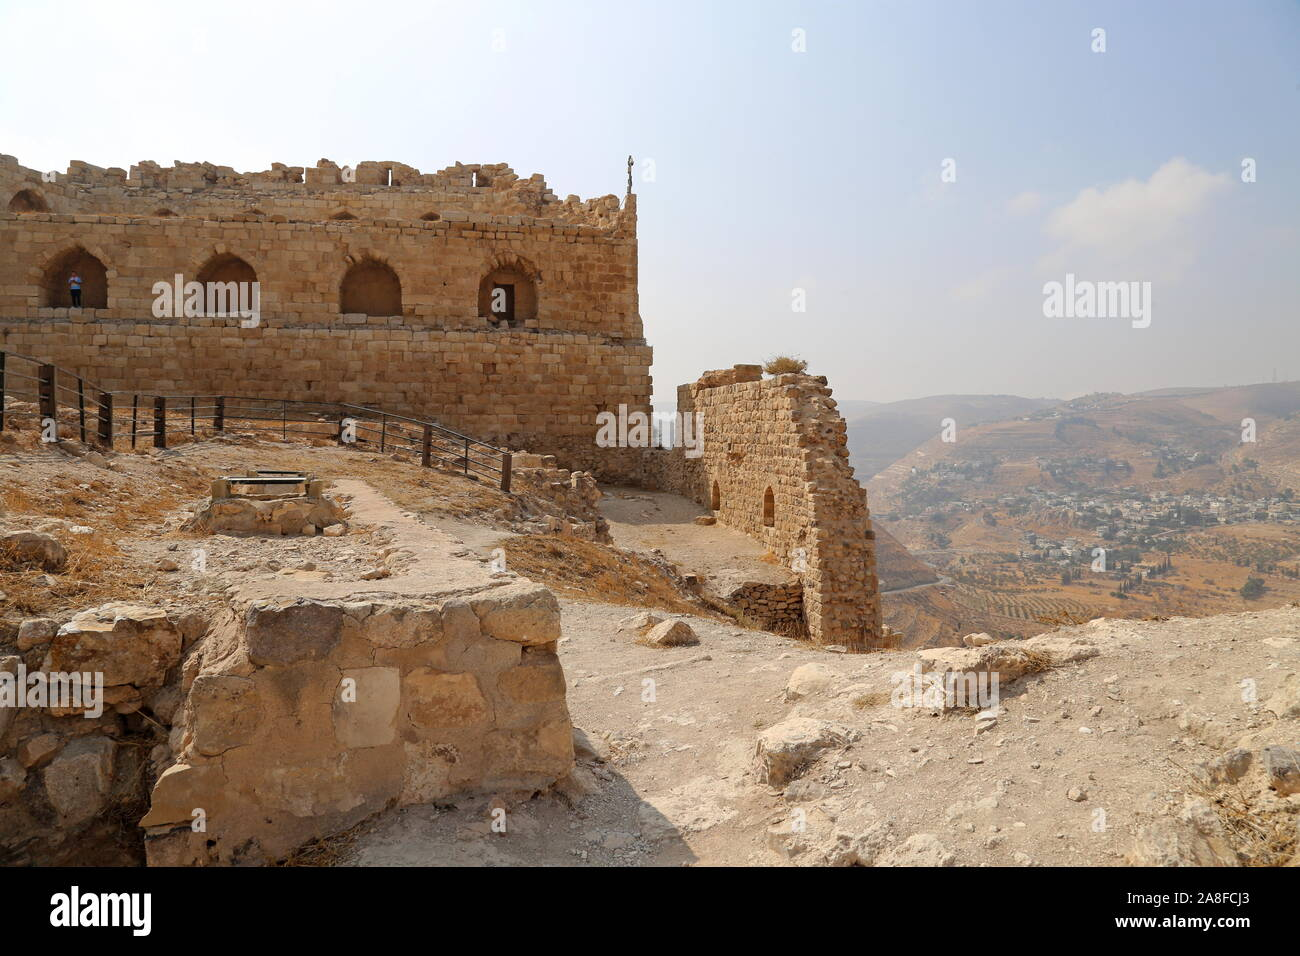 Mamluk Keep and West Wall, Karak Castle, Al Karak, Karak Governorate, Jordan, Middle East Stock Photo